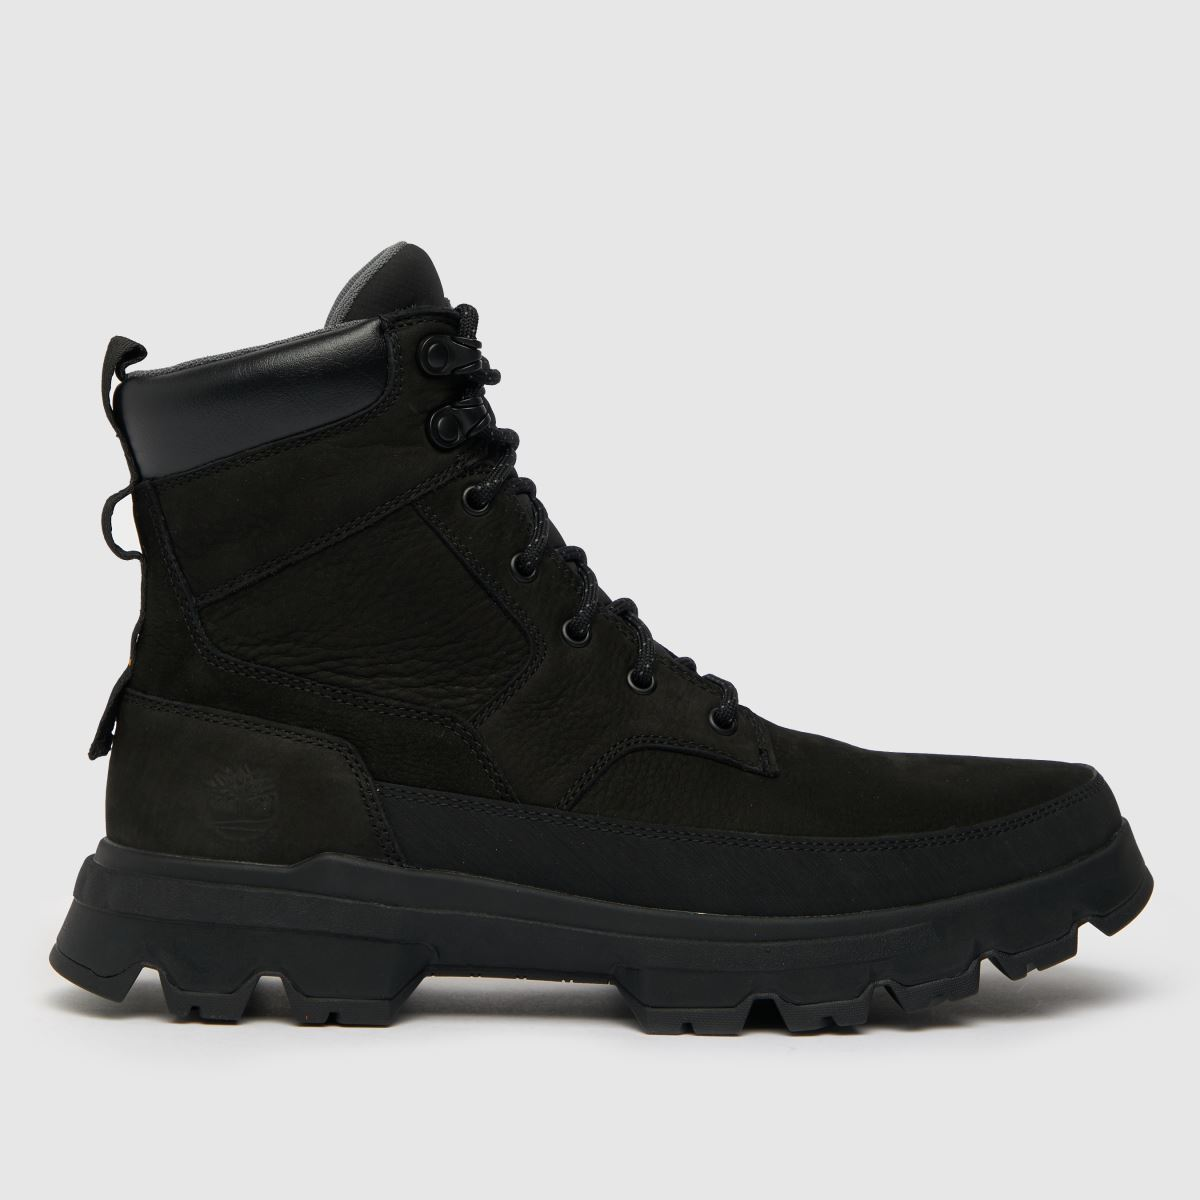 Timberland Black Timb Tbl Ultra Waterproof Boots